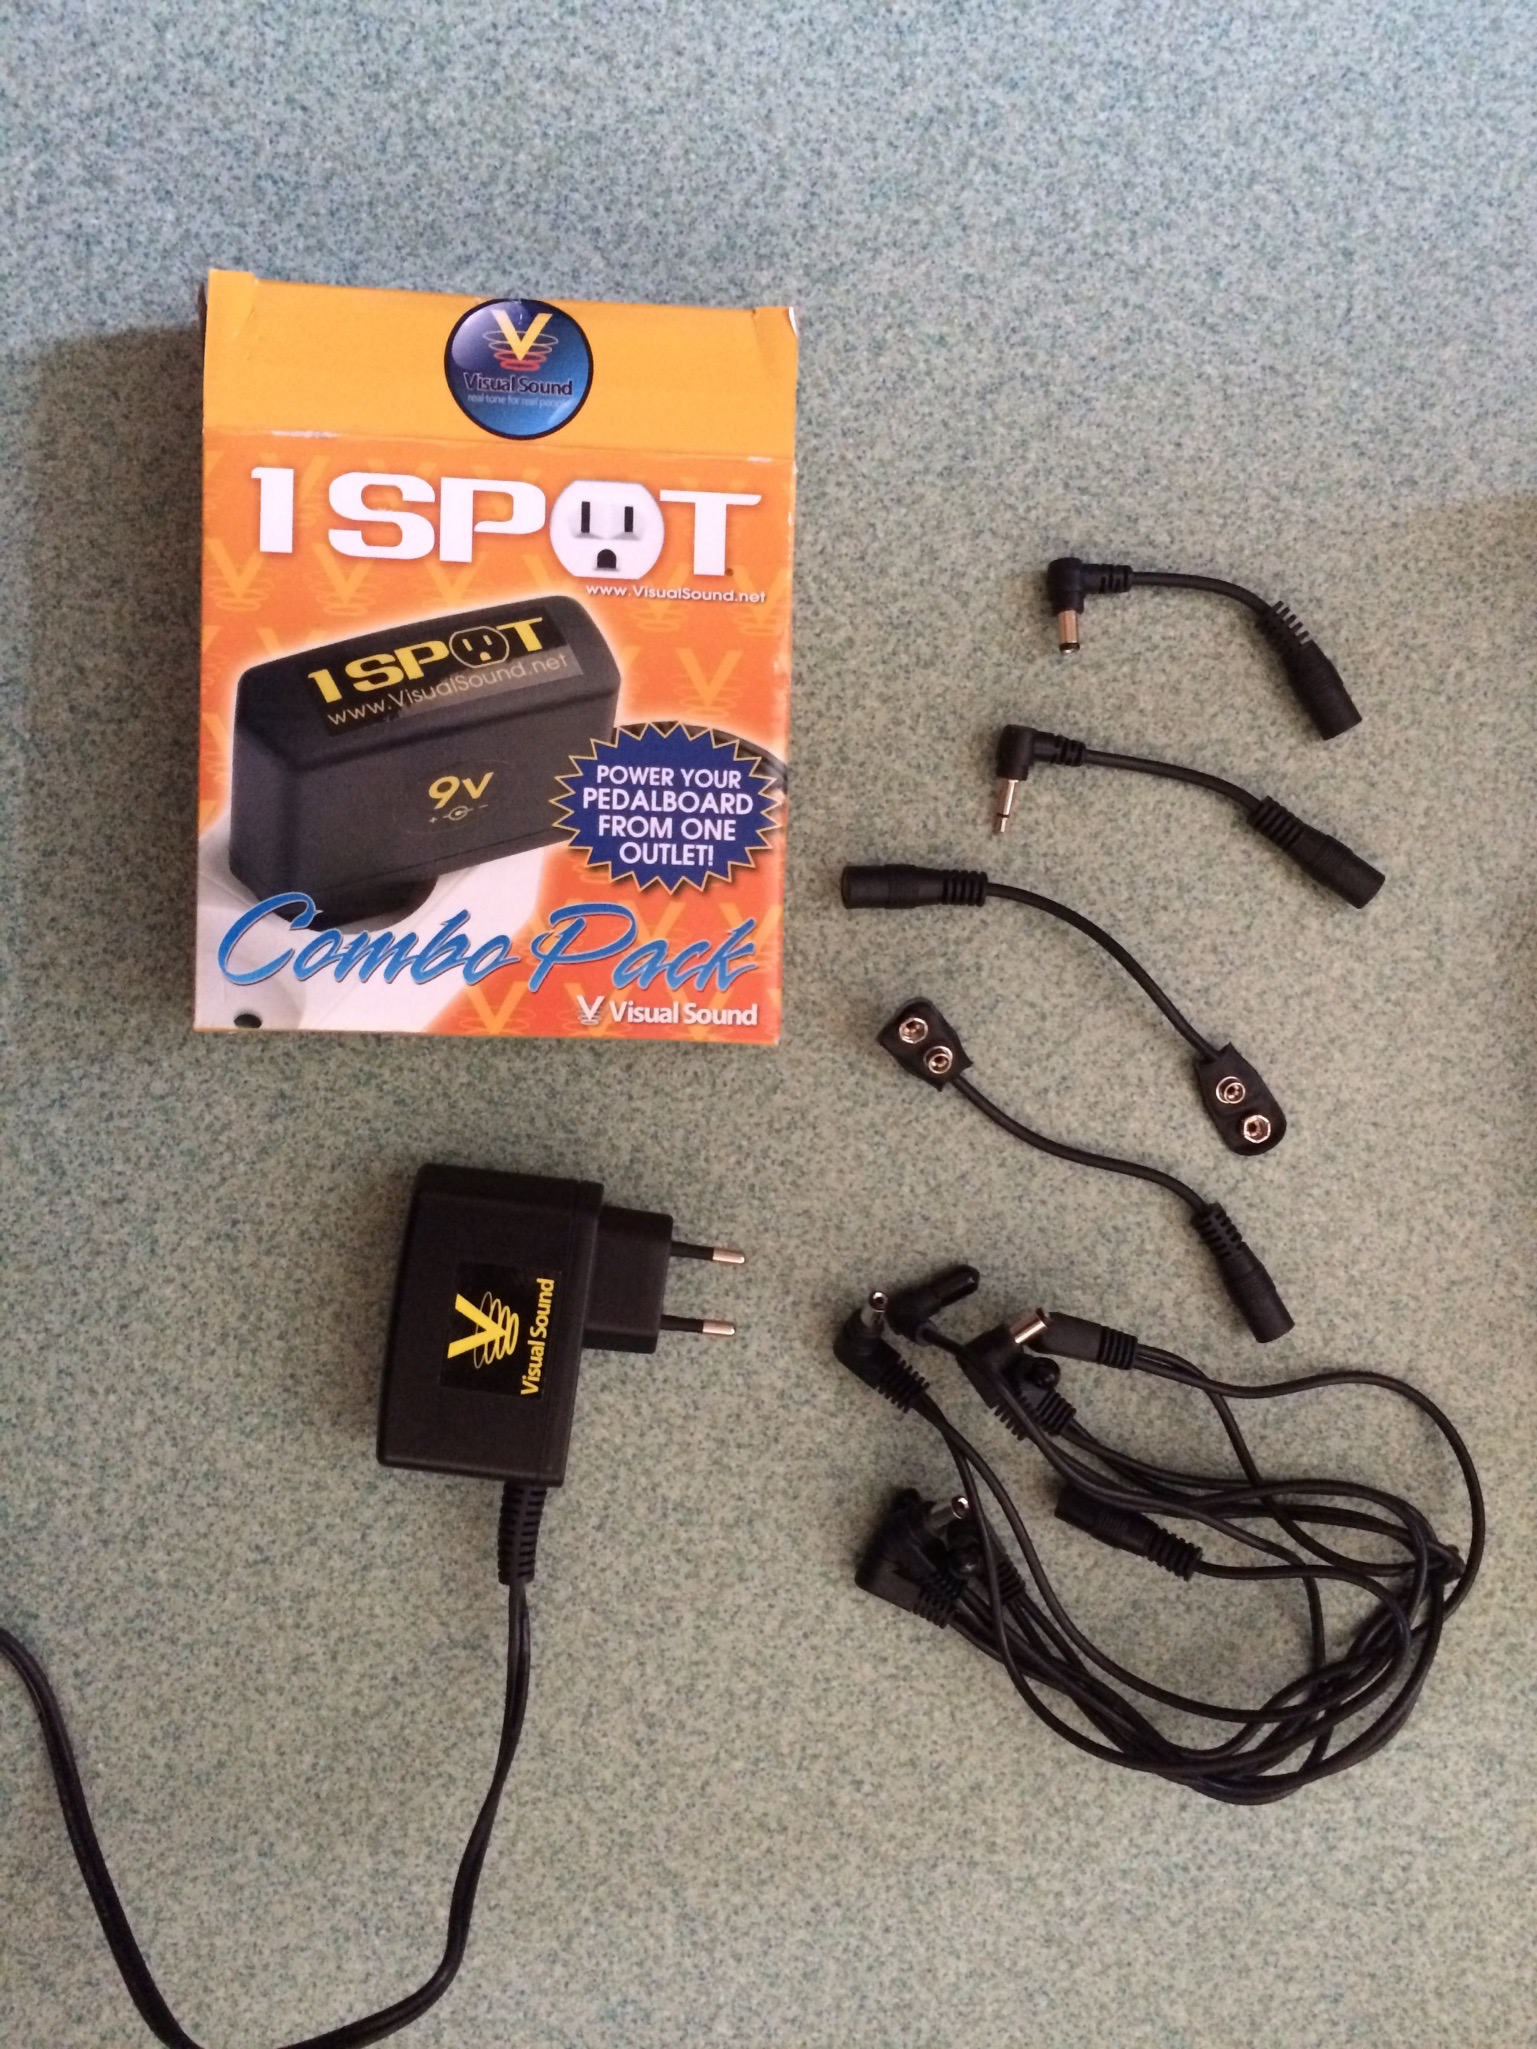 1 Spot Multi Plug 8 Cable